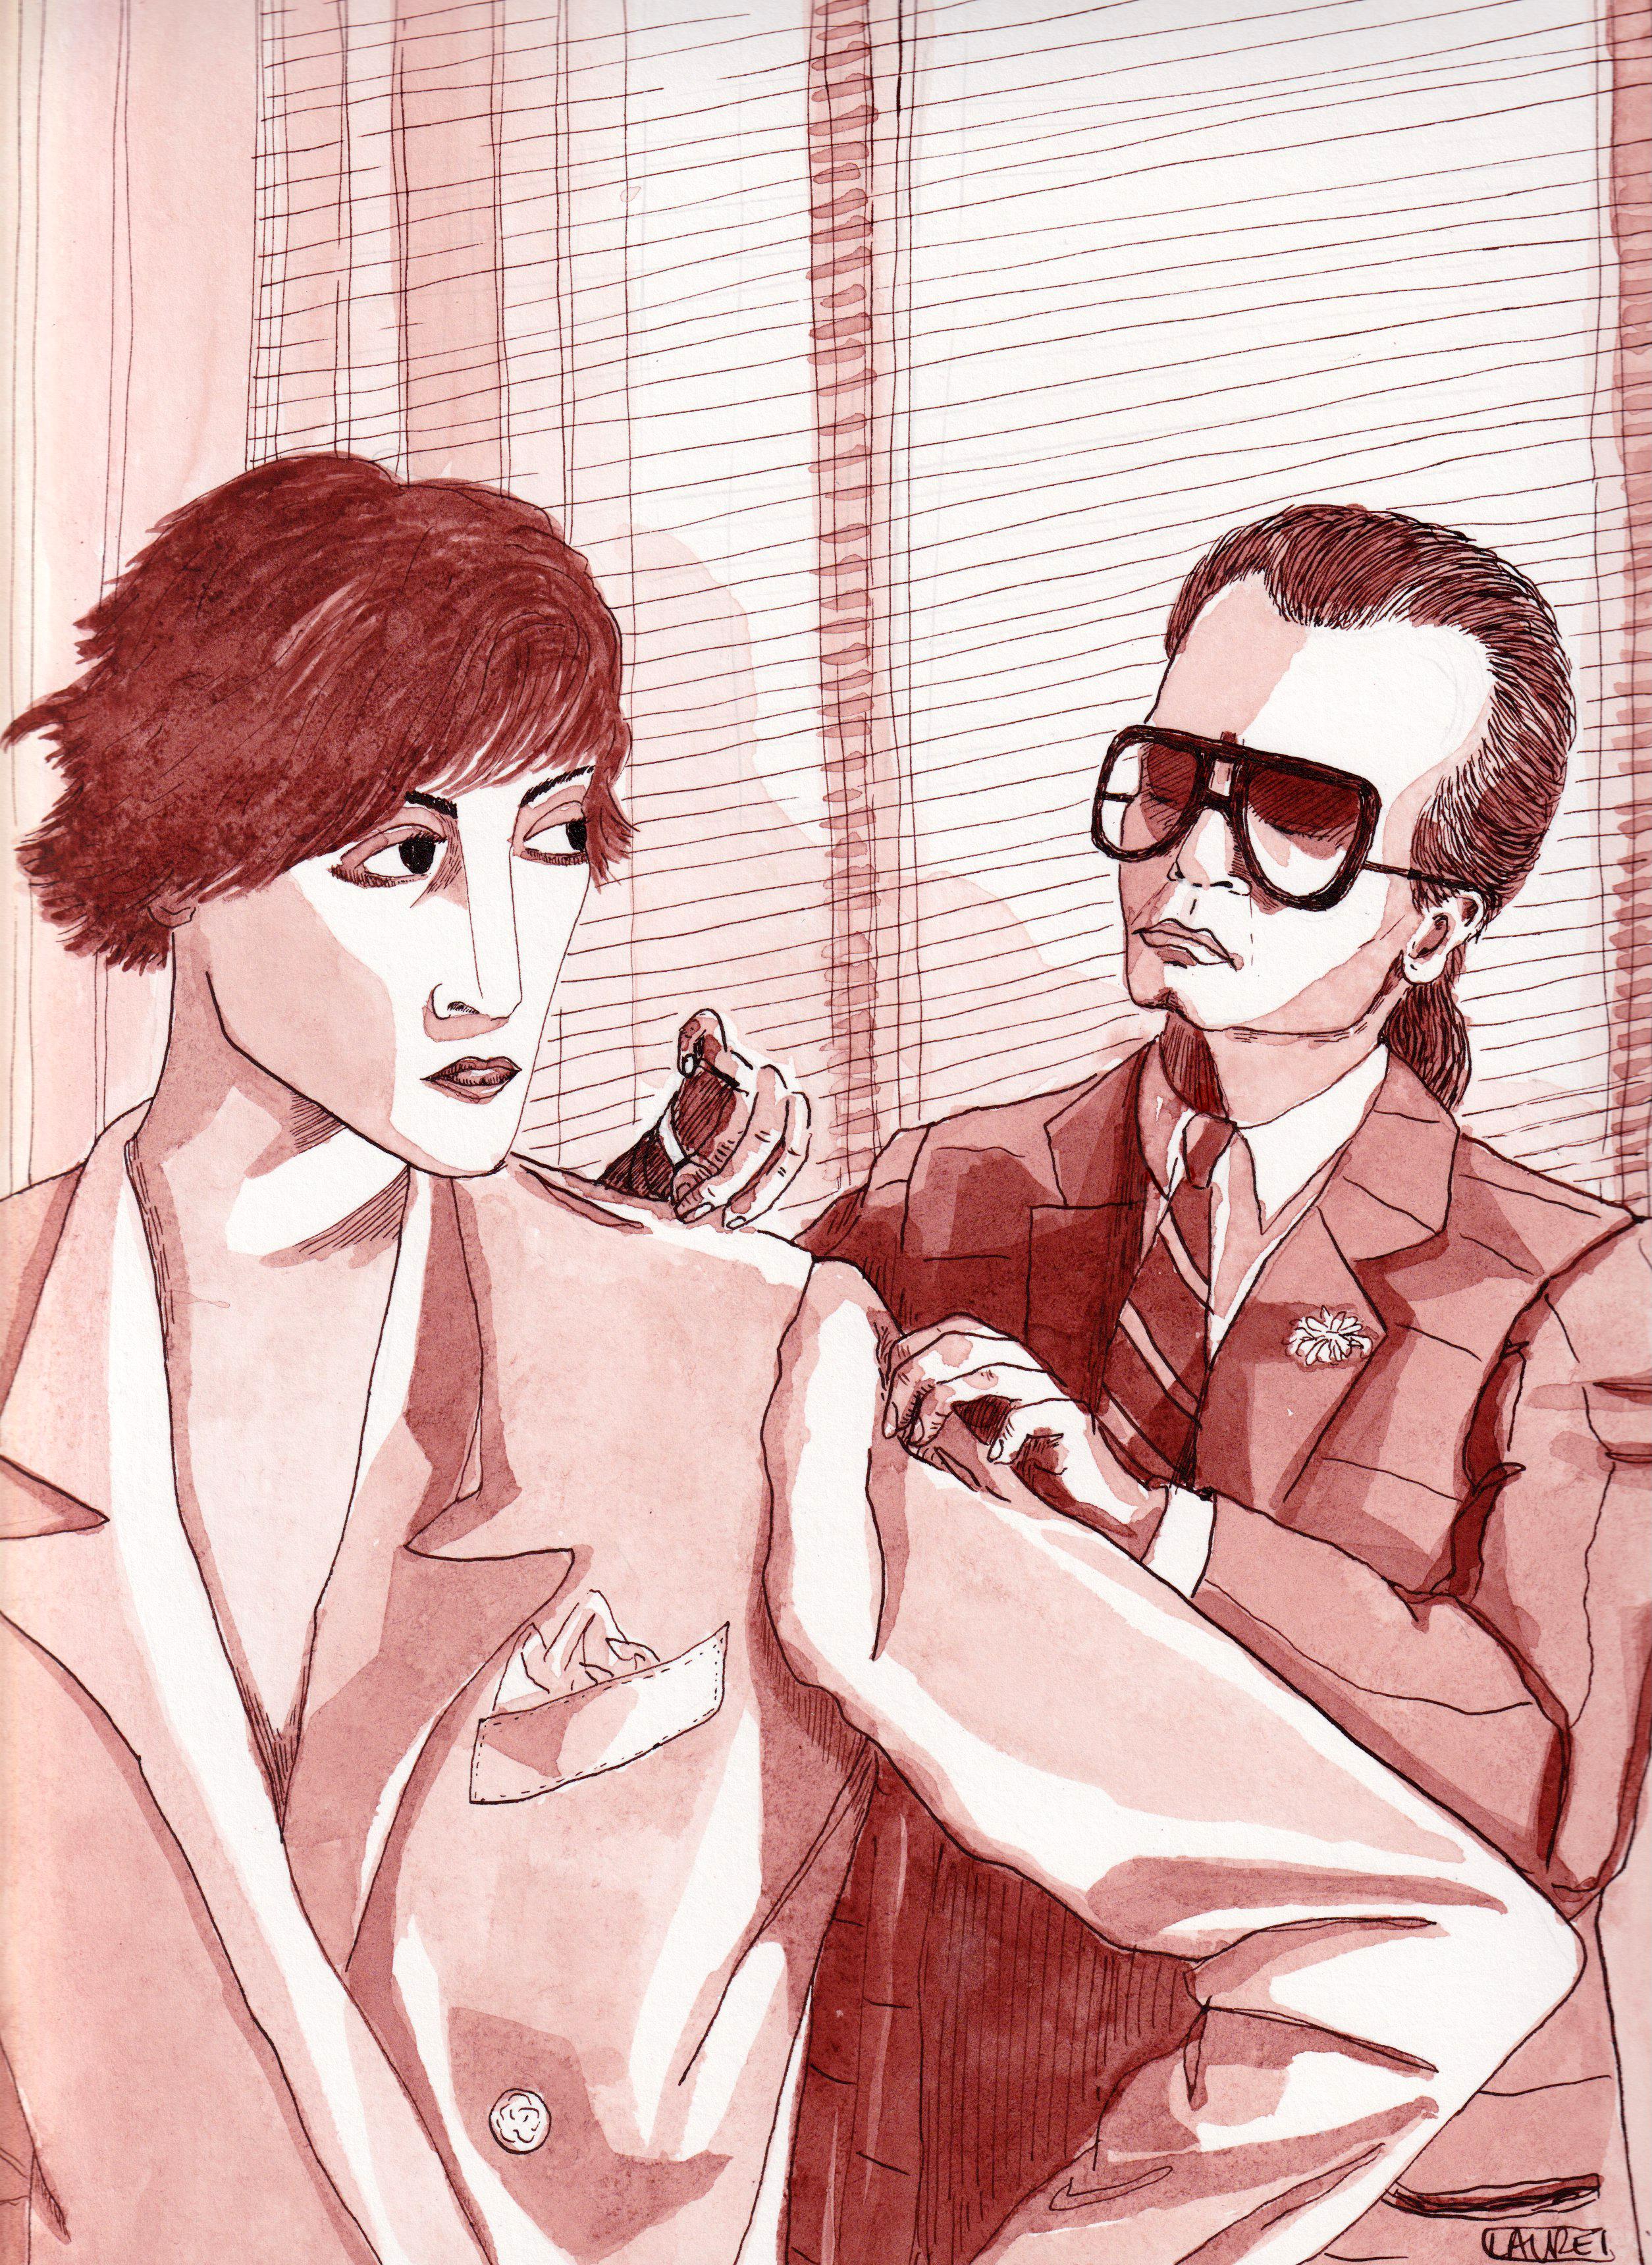 Karl Lagerfeld & Inès de la Fressange